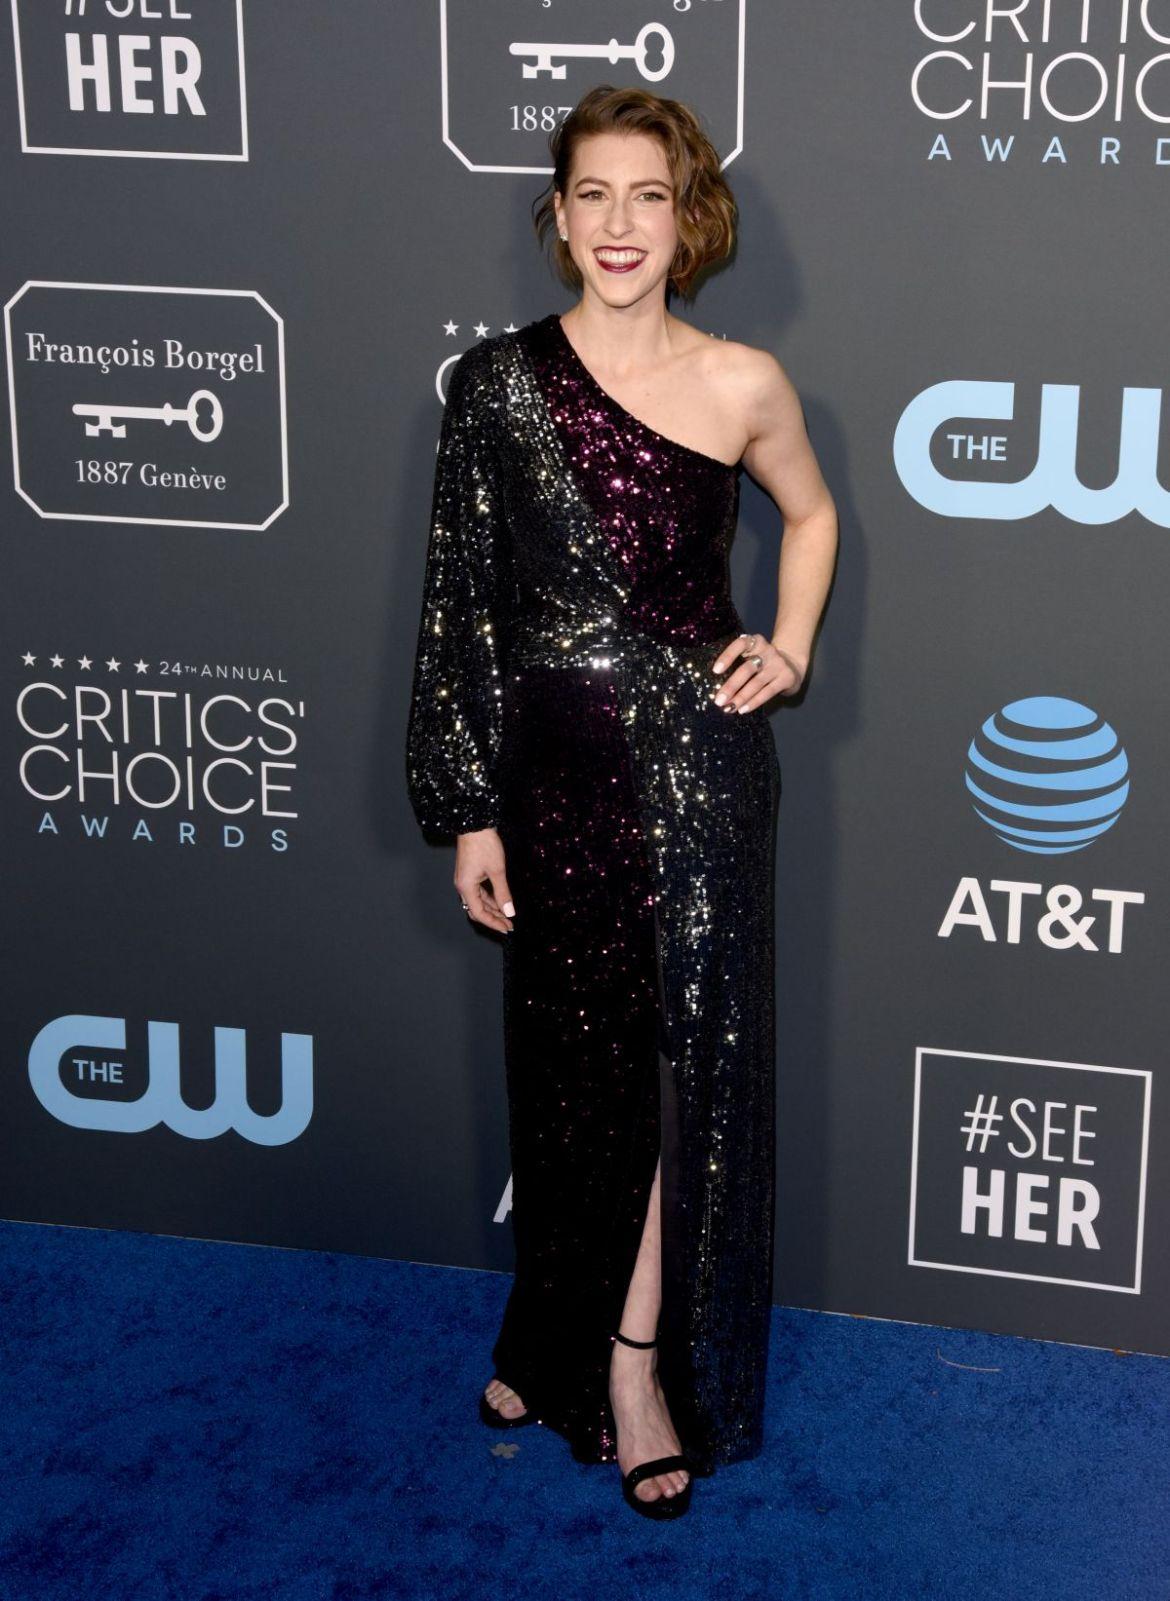 EDEN SHER at 2019 Critics' Choice Awards in Santa Monica 01/13/2019